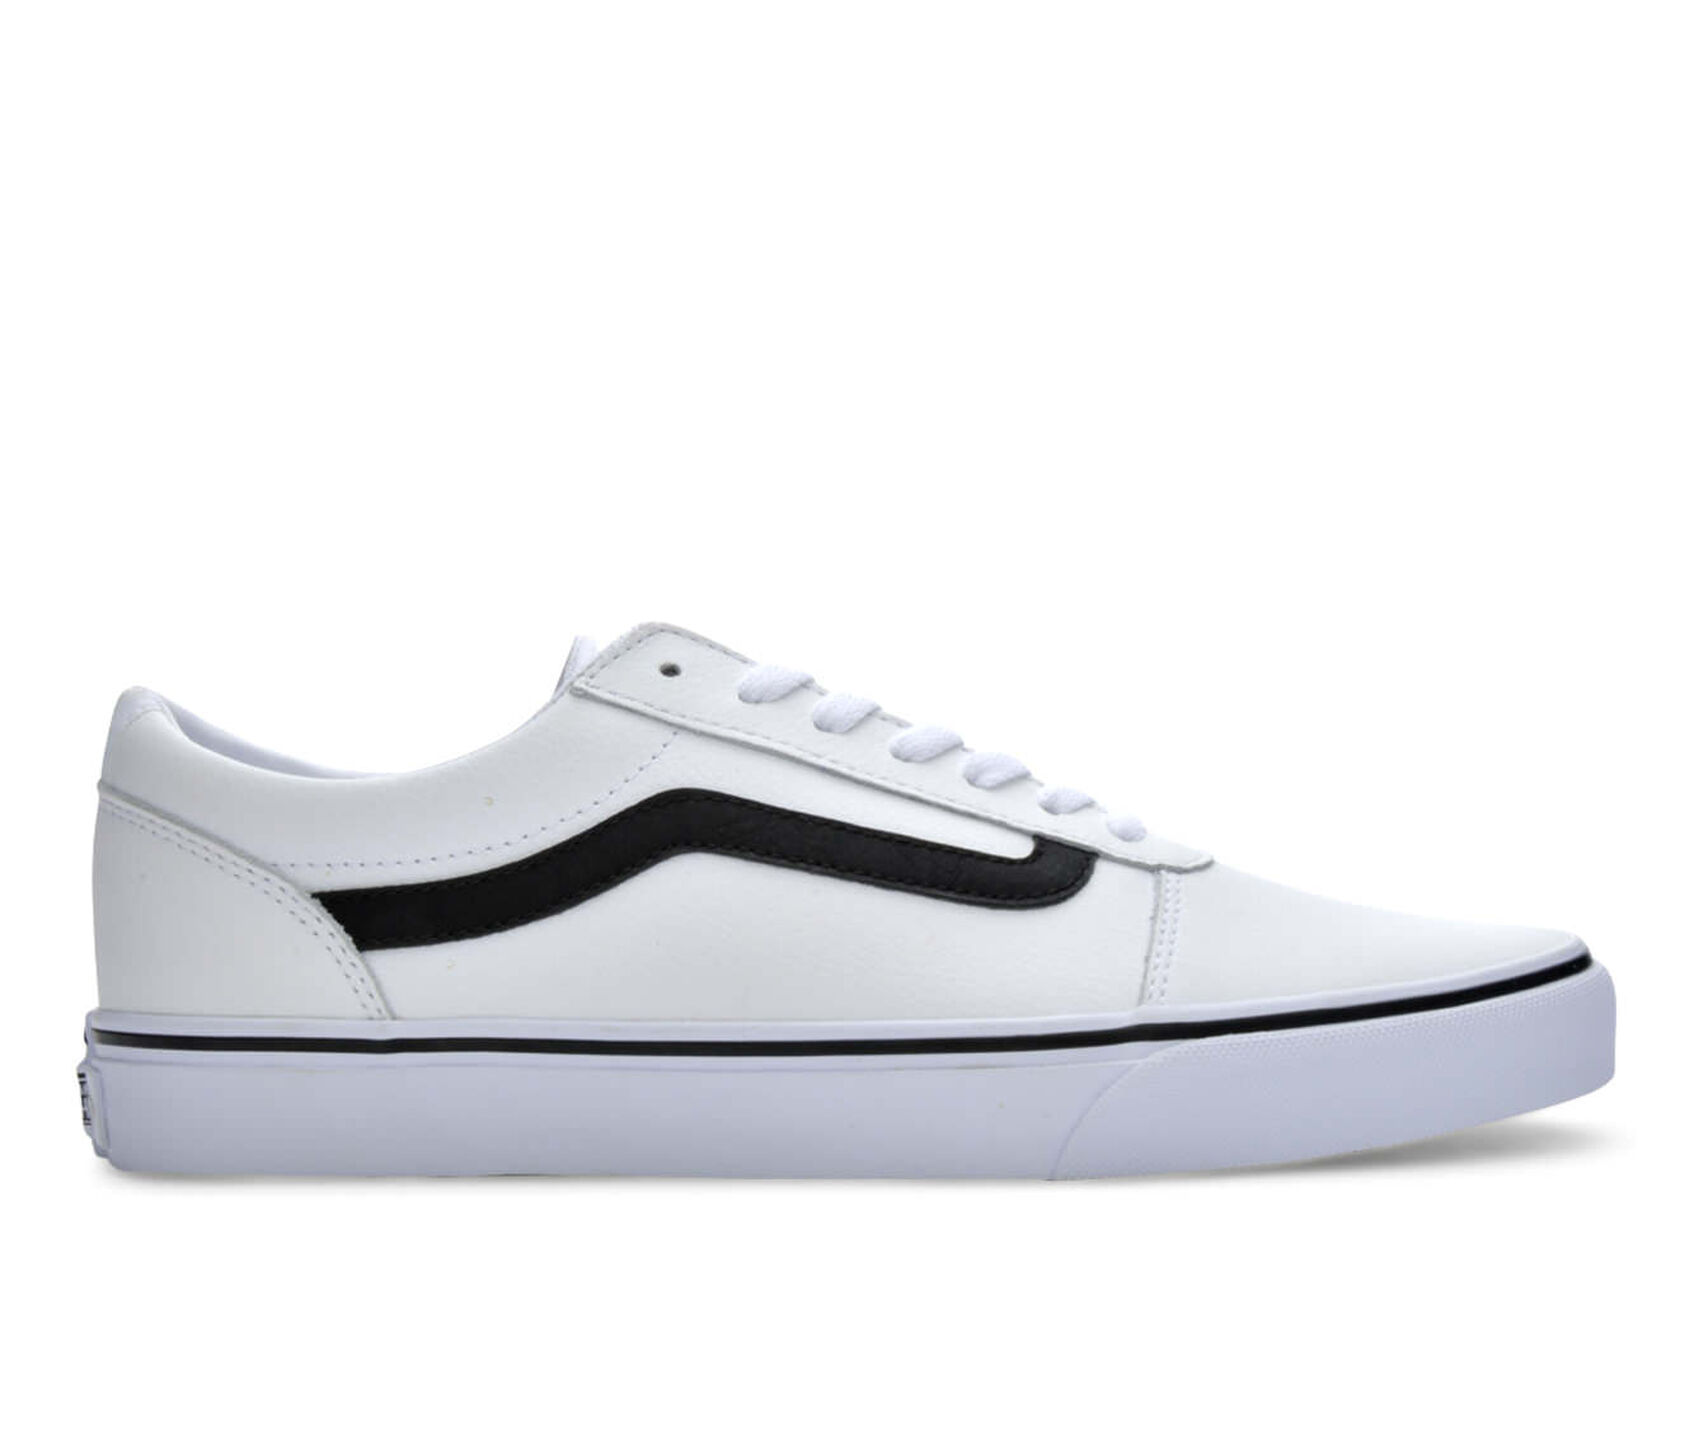 online store 60ef1 9d61a Men39s Vans Ward Leather Skate Shoes ...